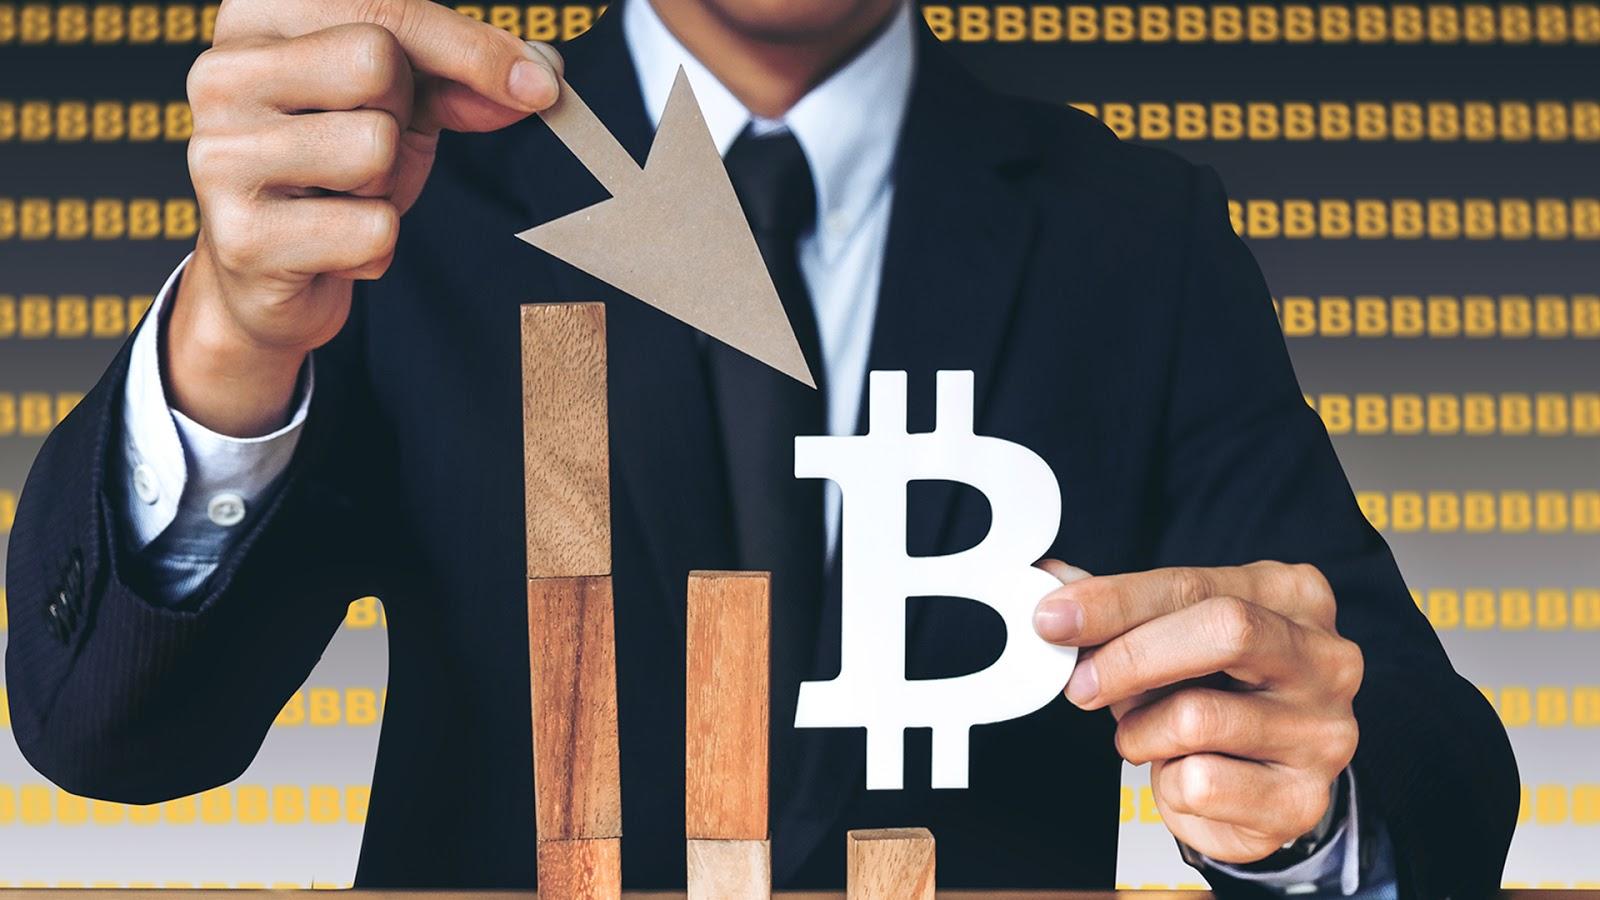 Explaining the Intense Crypto Volatility - Will it Recuperate?